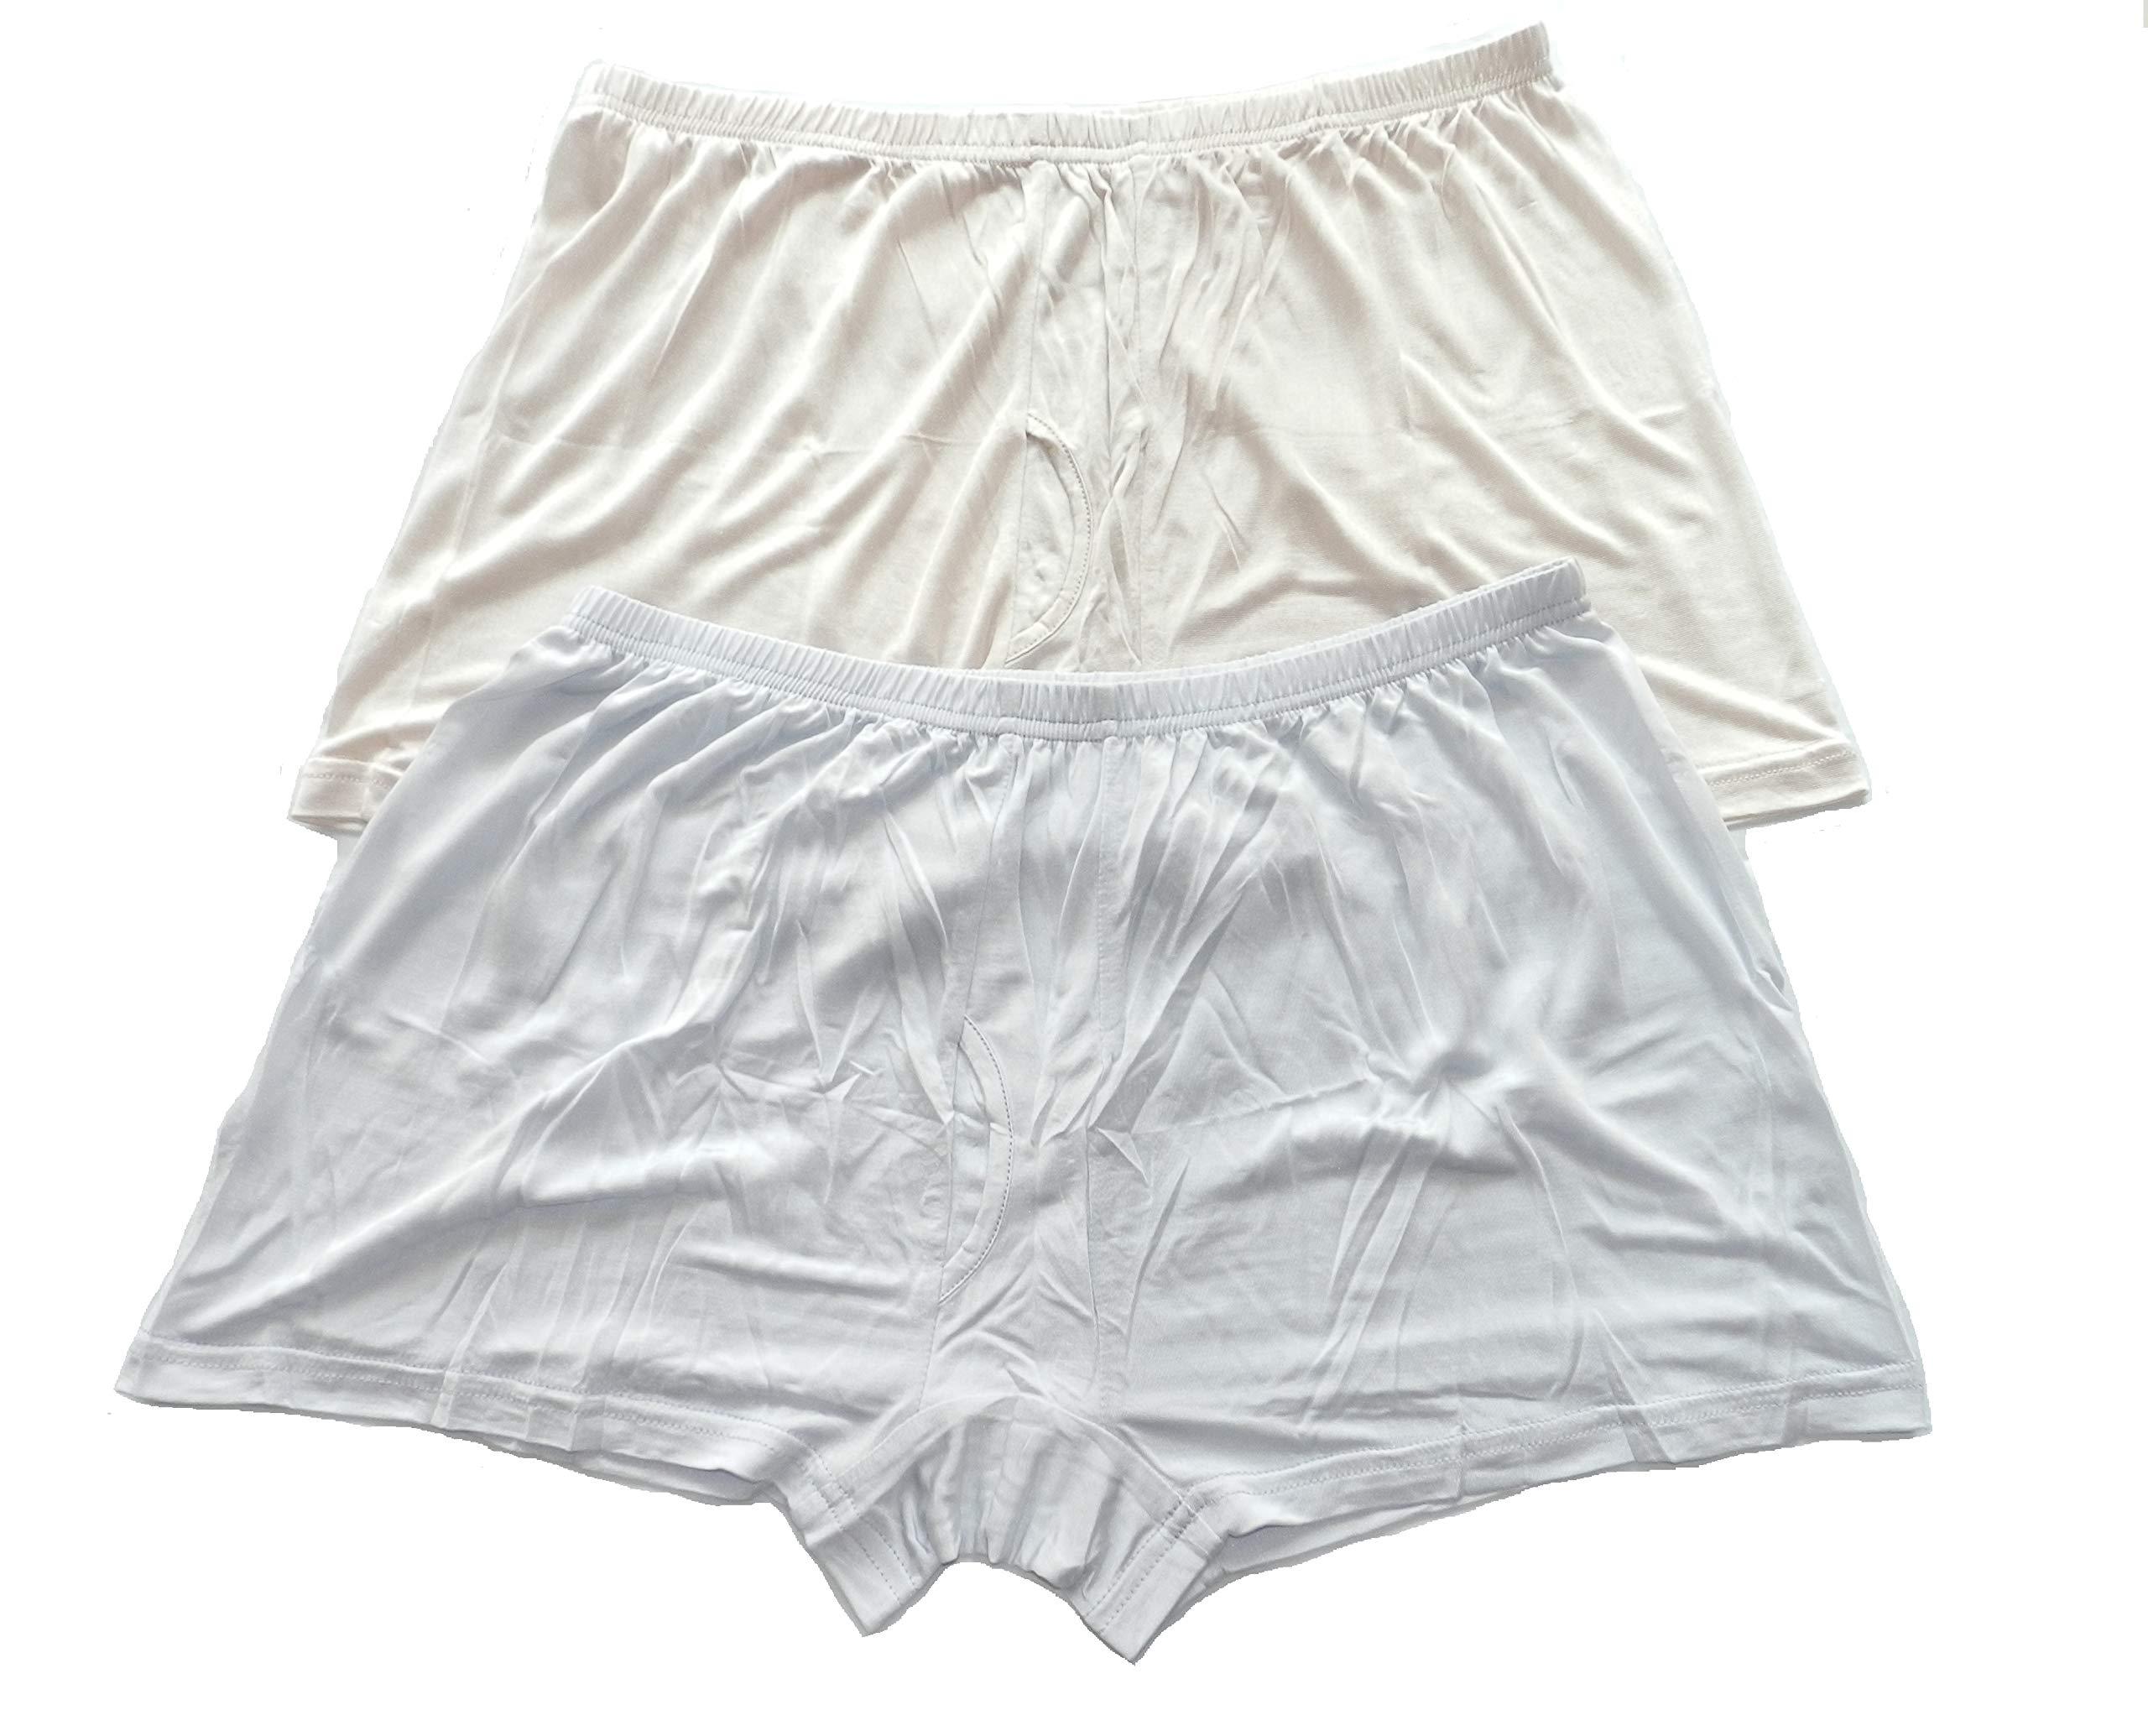 1475d40c18d1 Qianya Men's Silk Underwear Boxer Silk Briefs 100% Silk Knit 2 Pairs in One  Economic Pack (3XL)